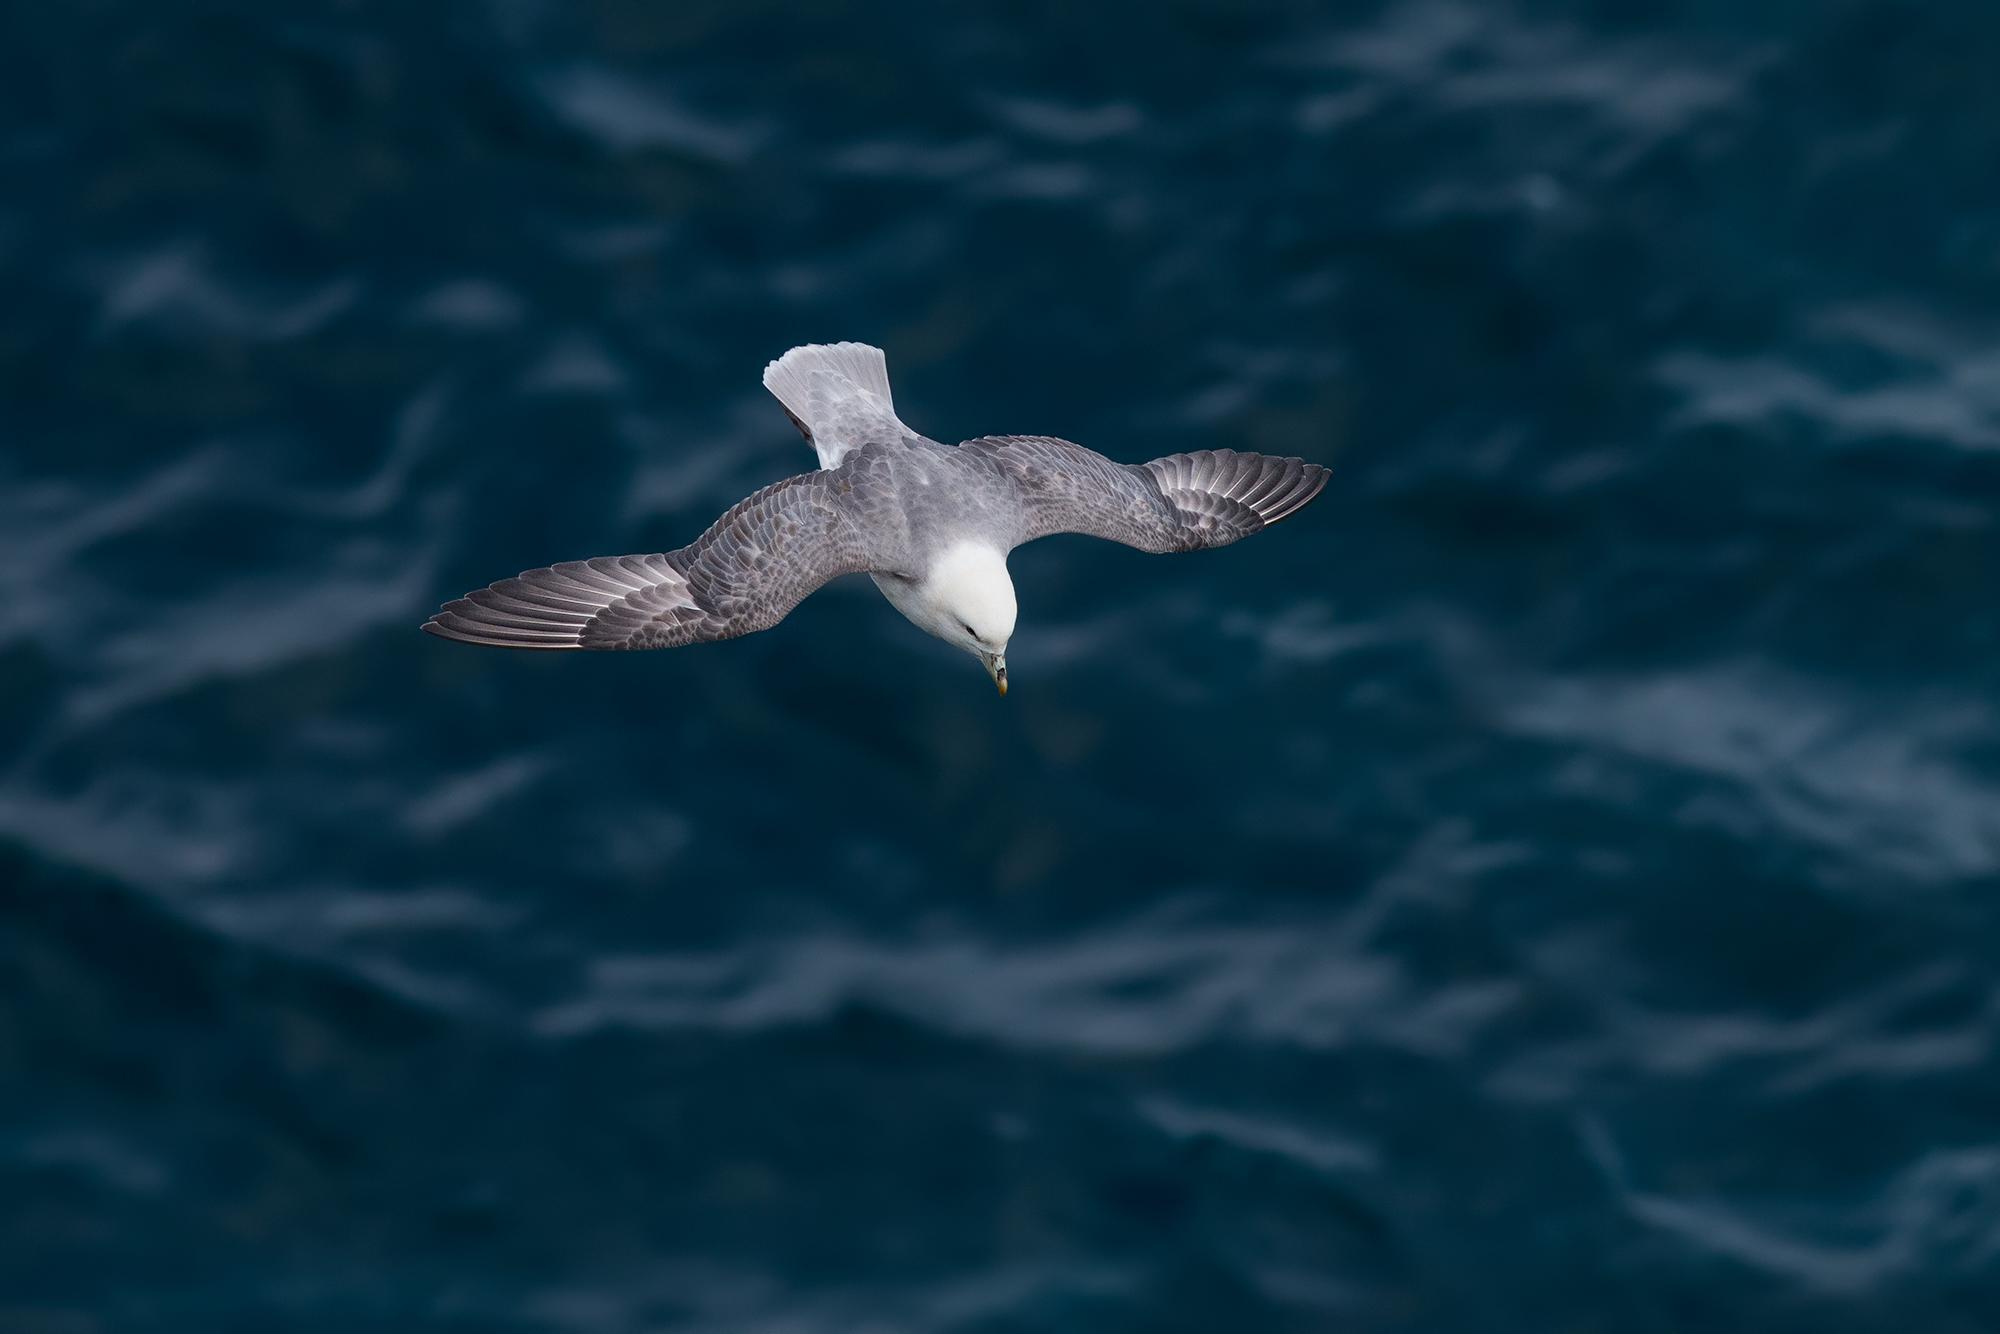 Stormfågel-JPEG_web 5.jpg